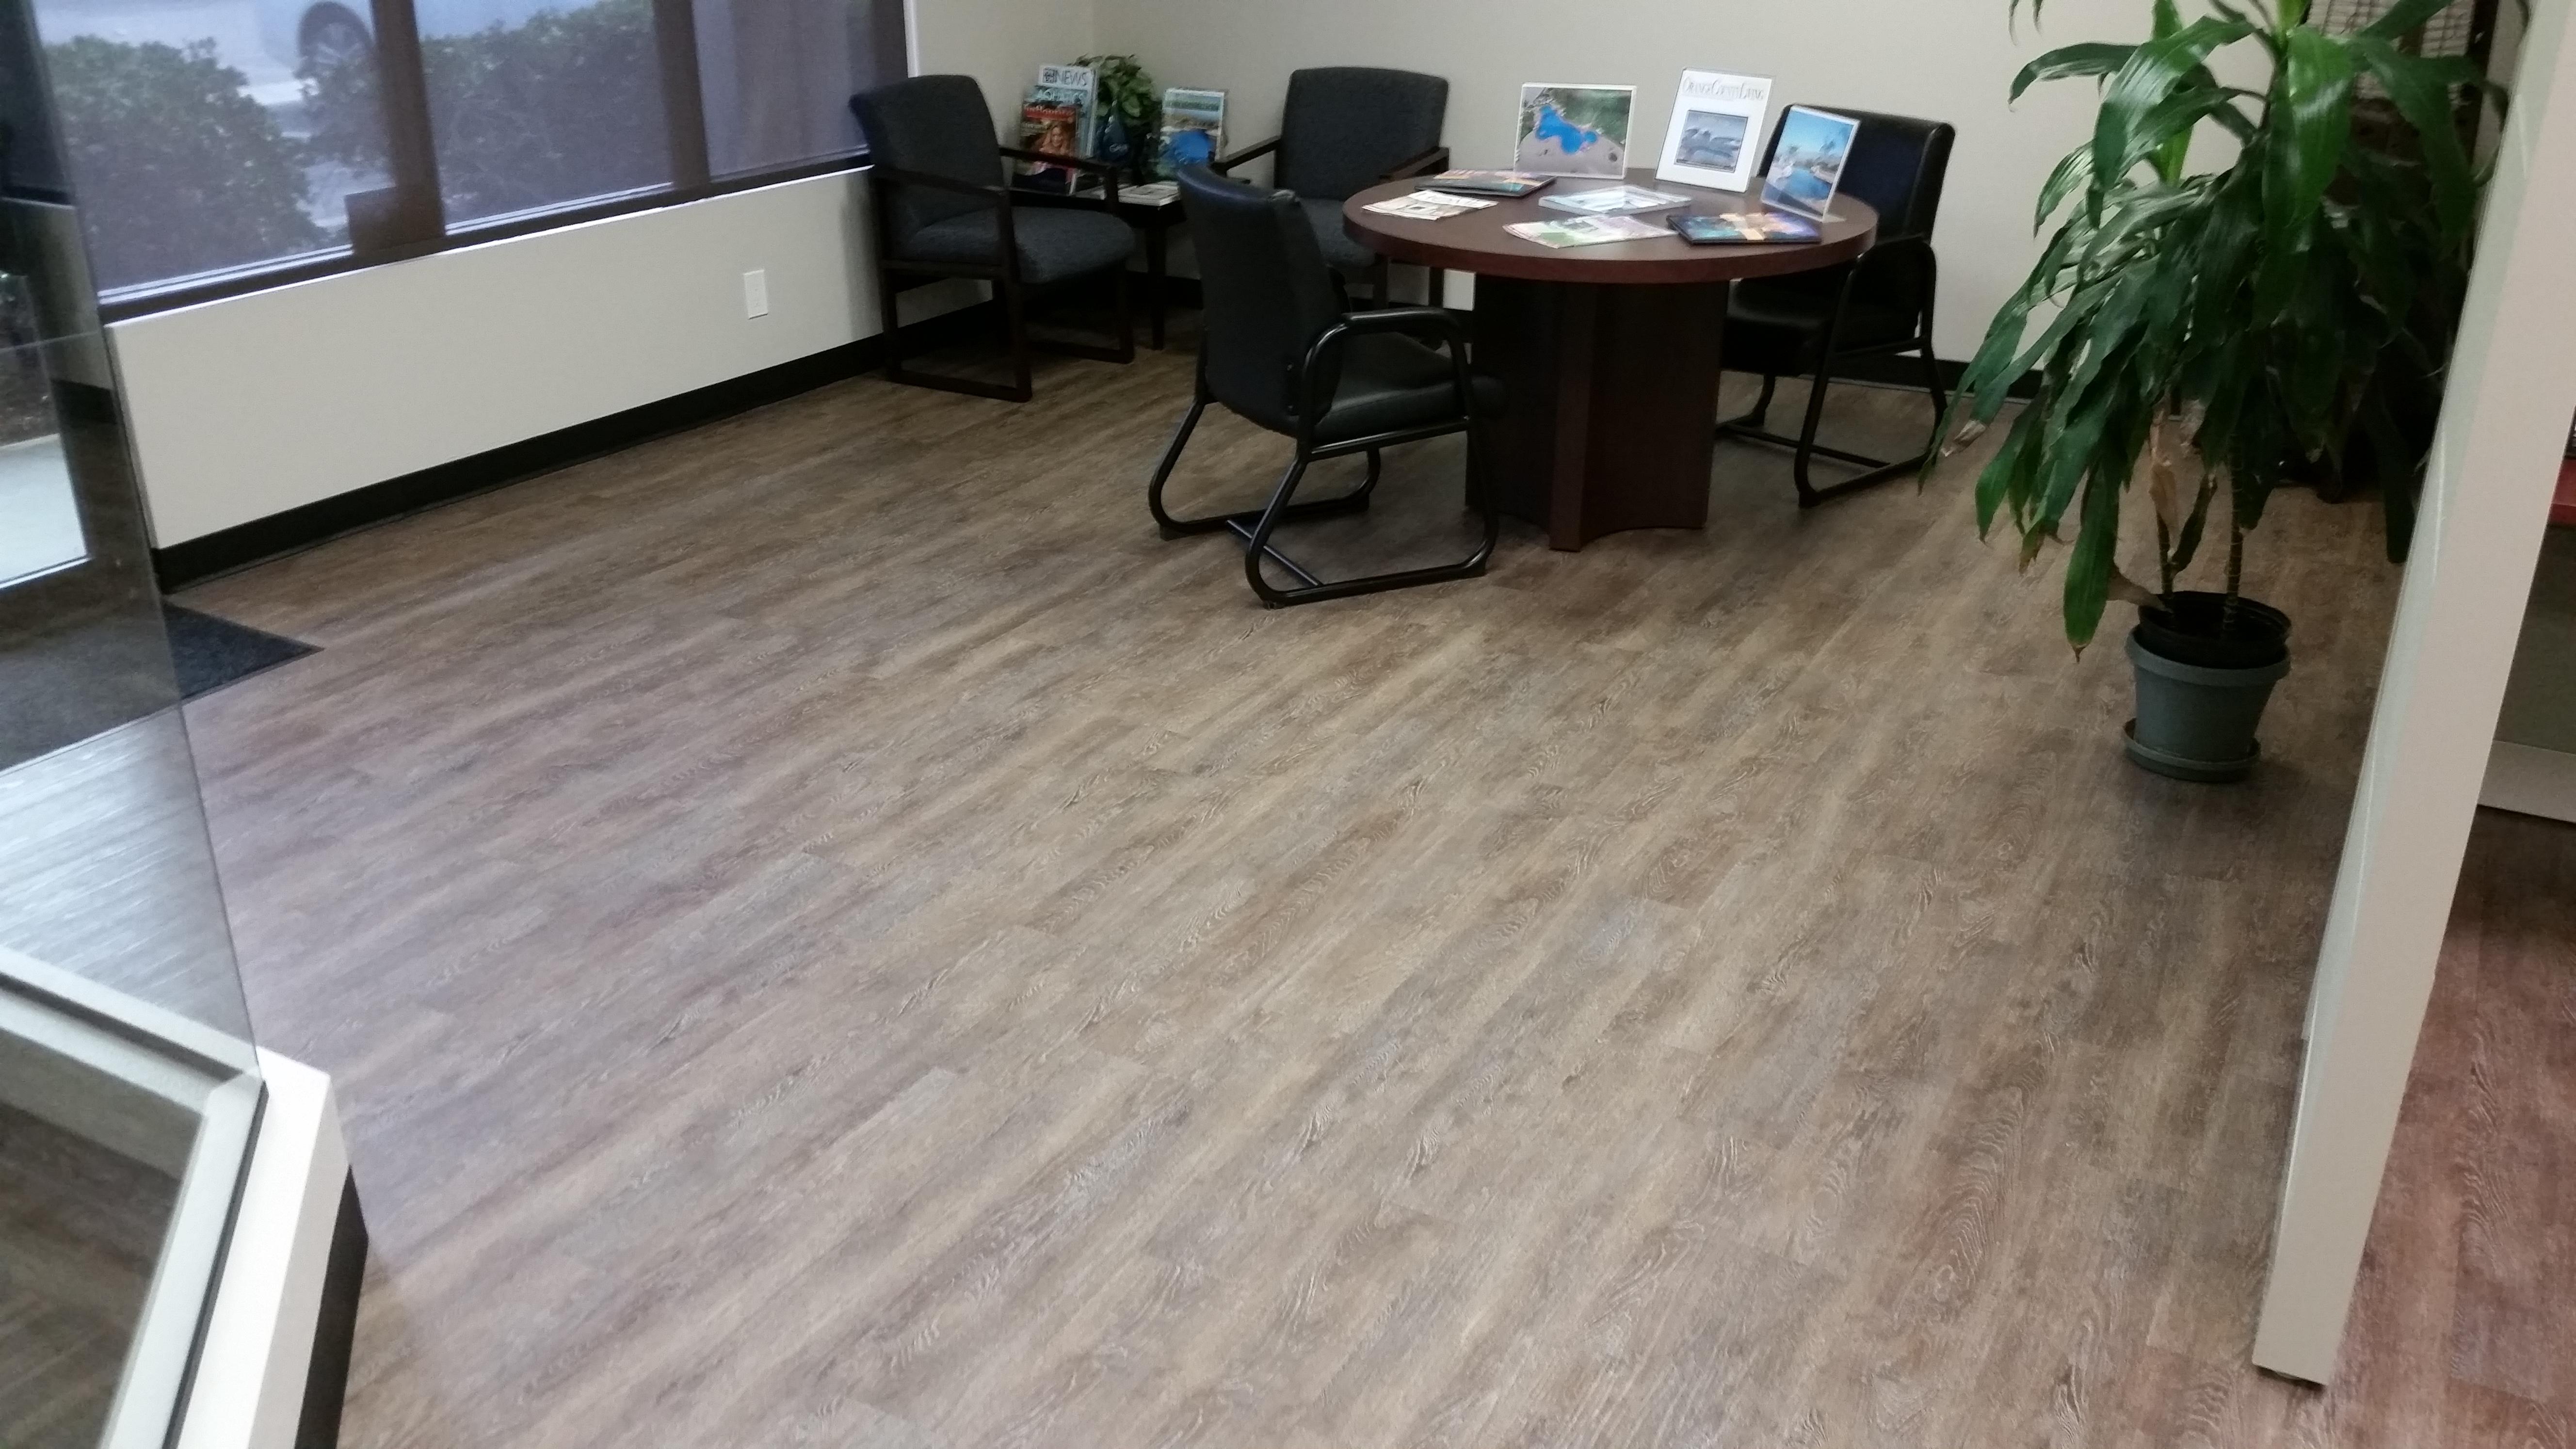 Wally's Carpet & Tile image 0